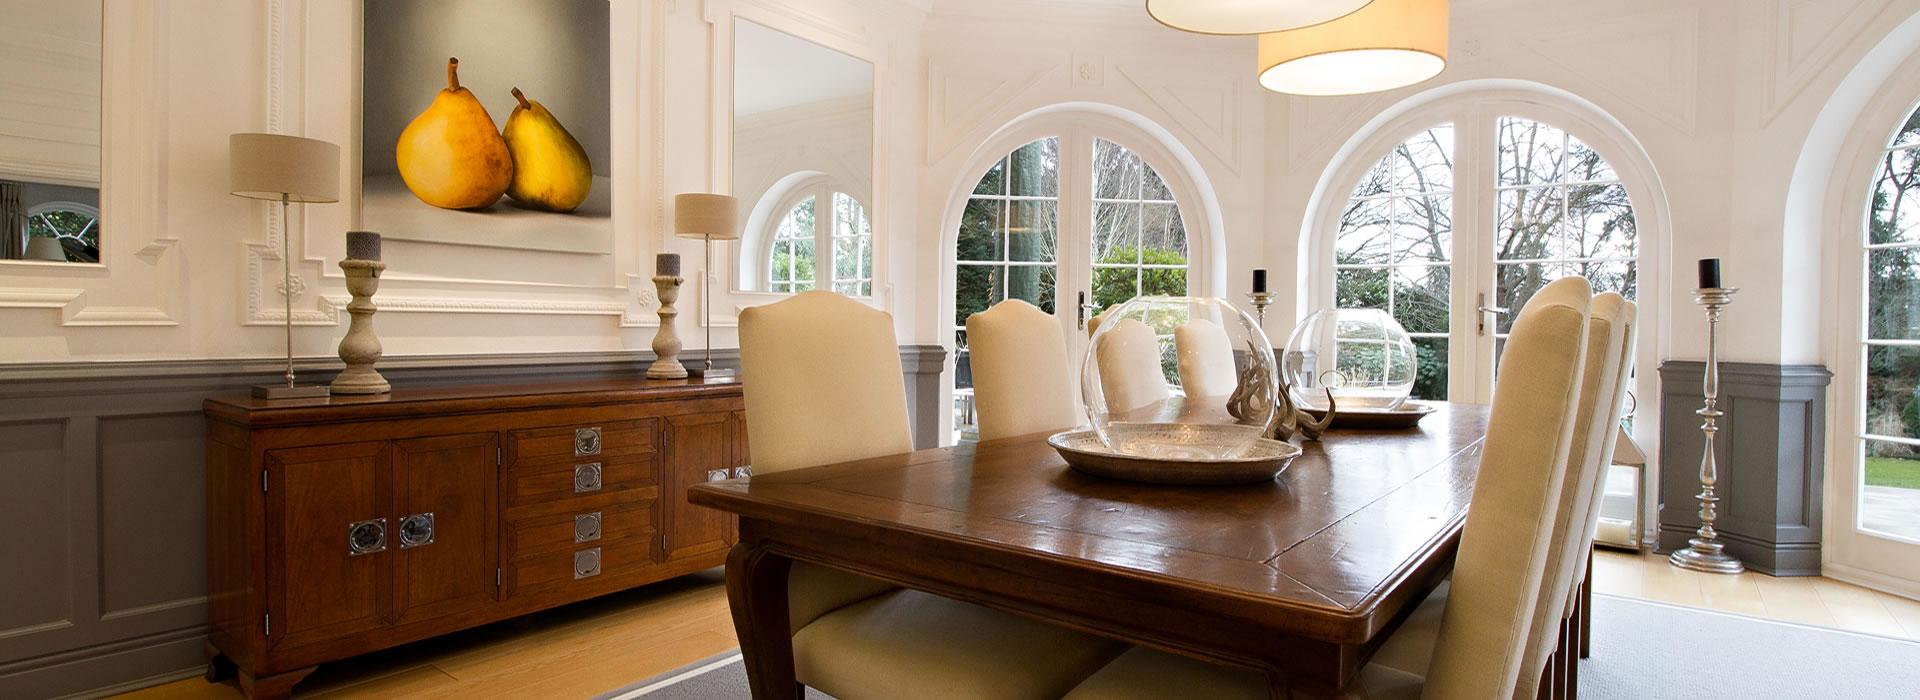 Cobham Dining Room